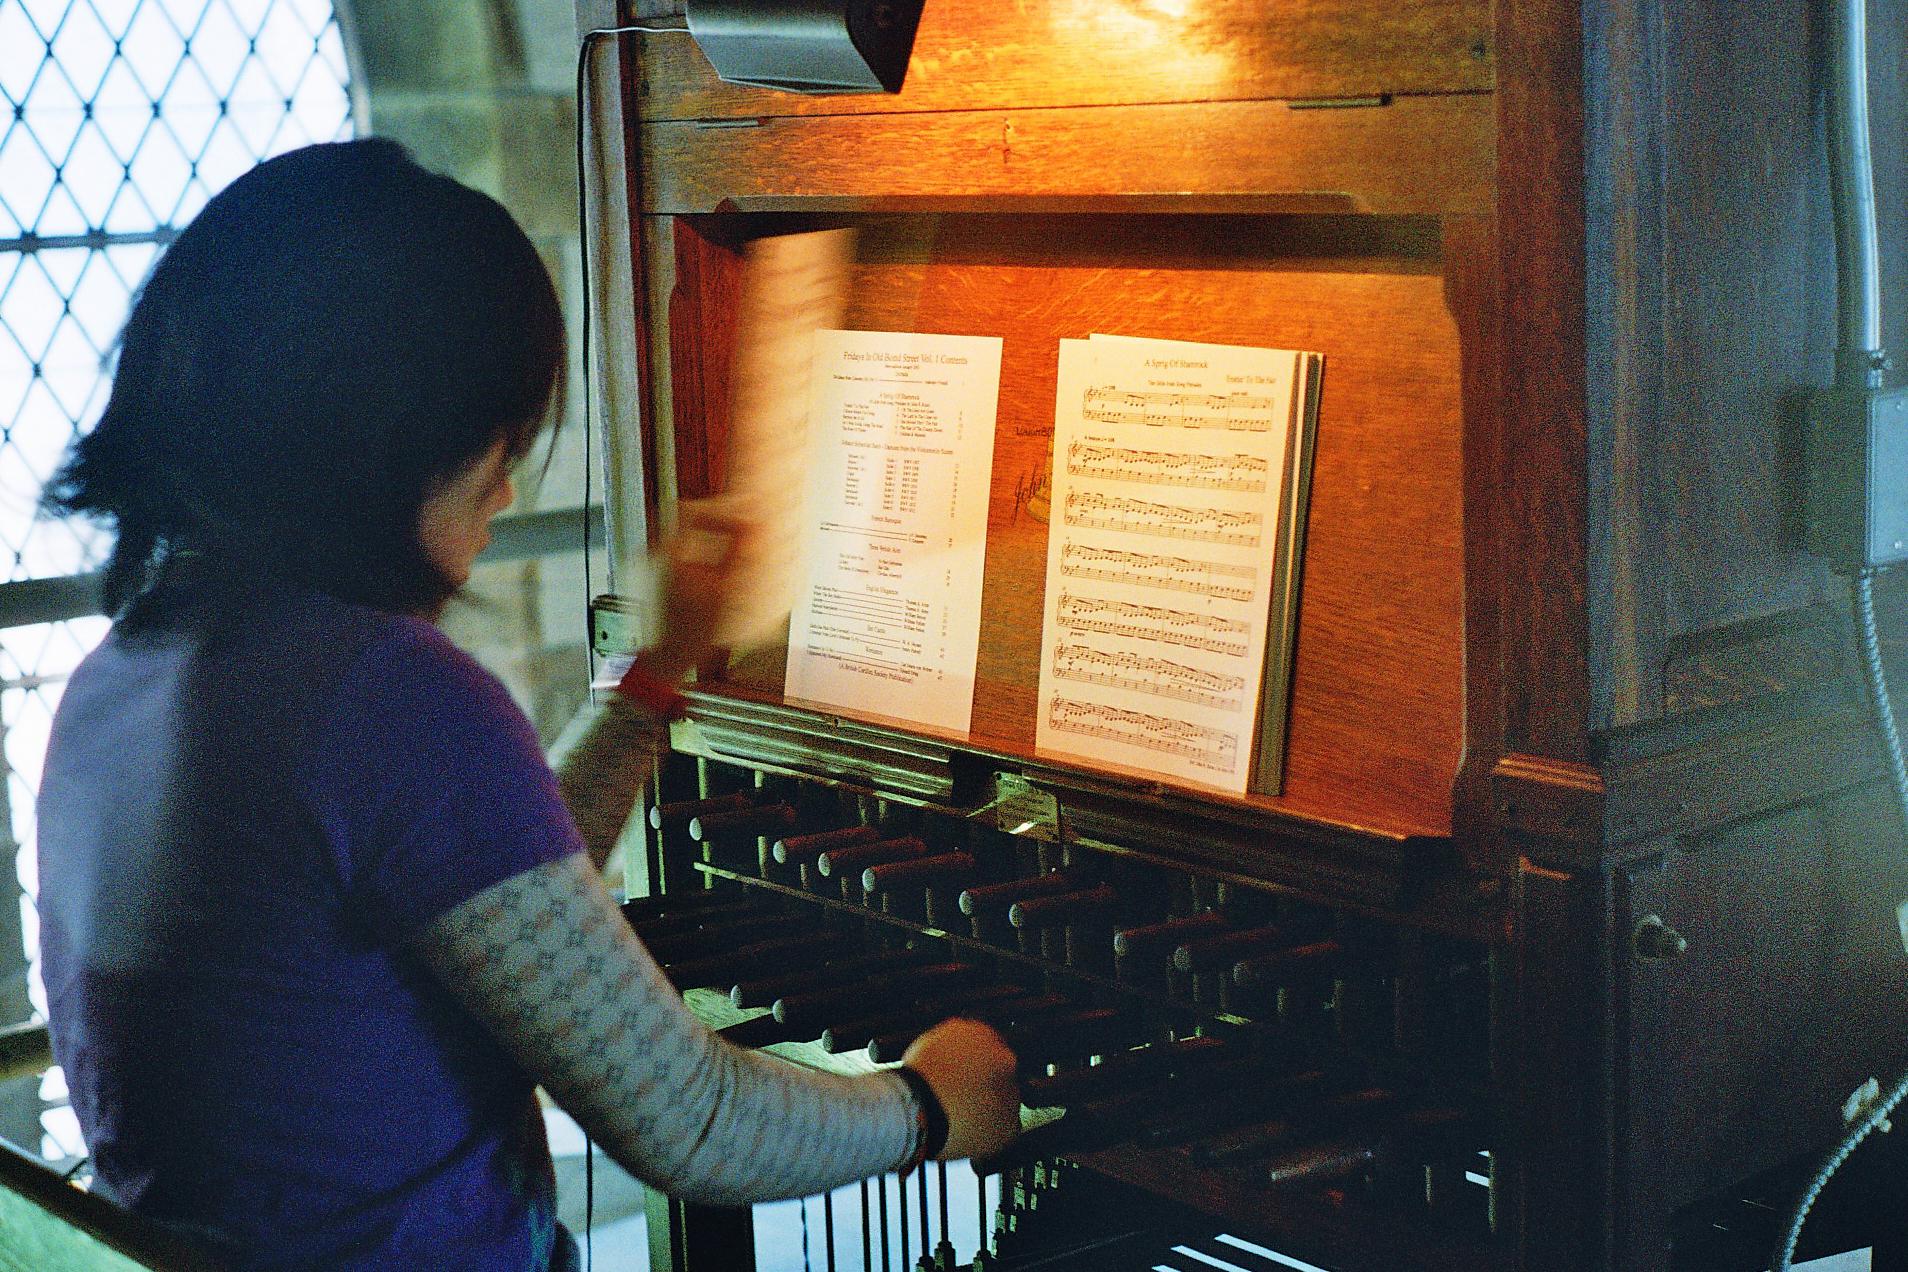 Carillonneur Julie Zhu